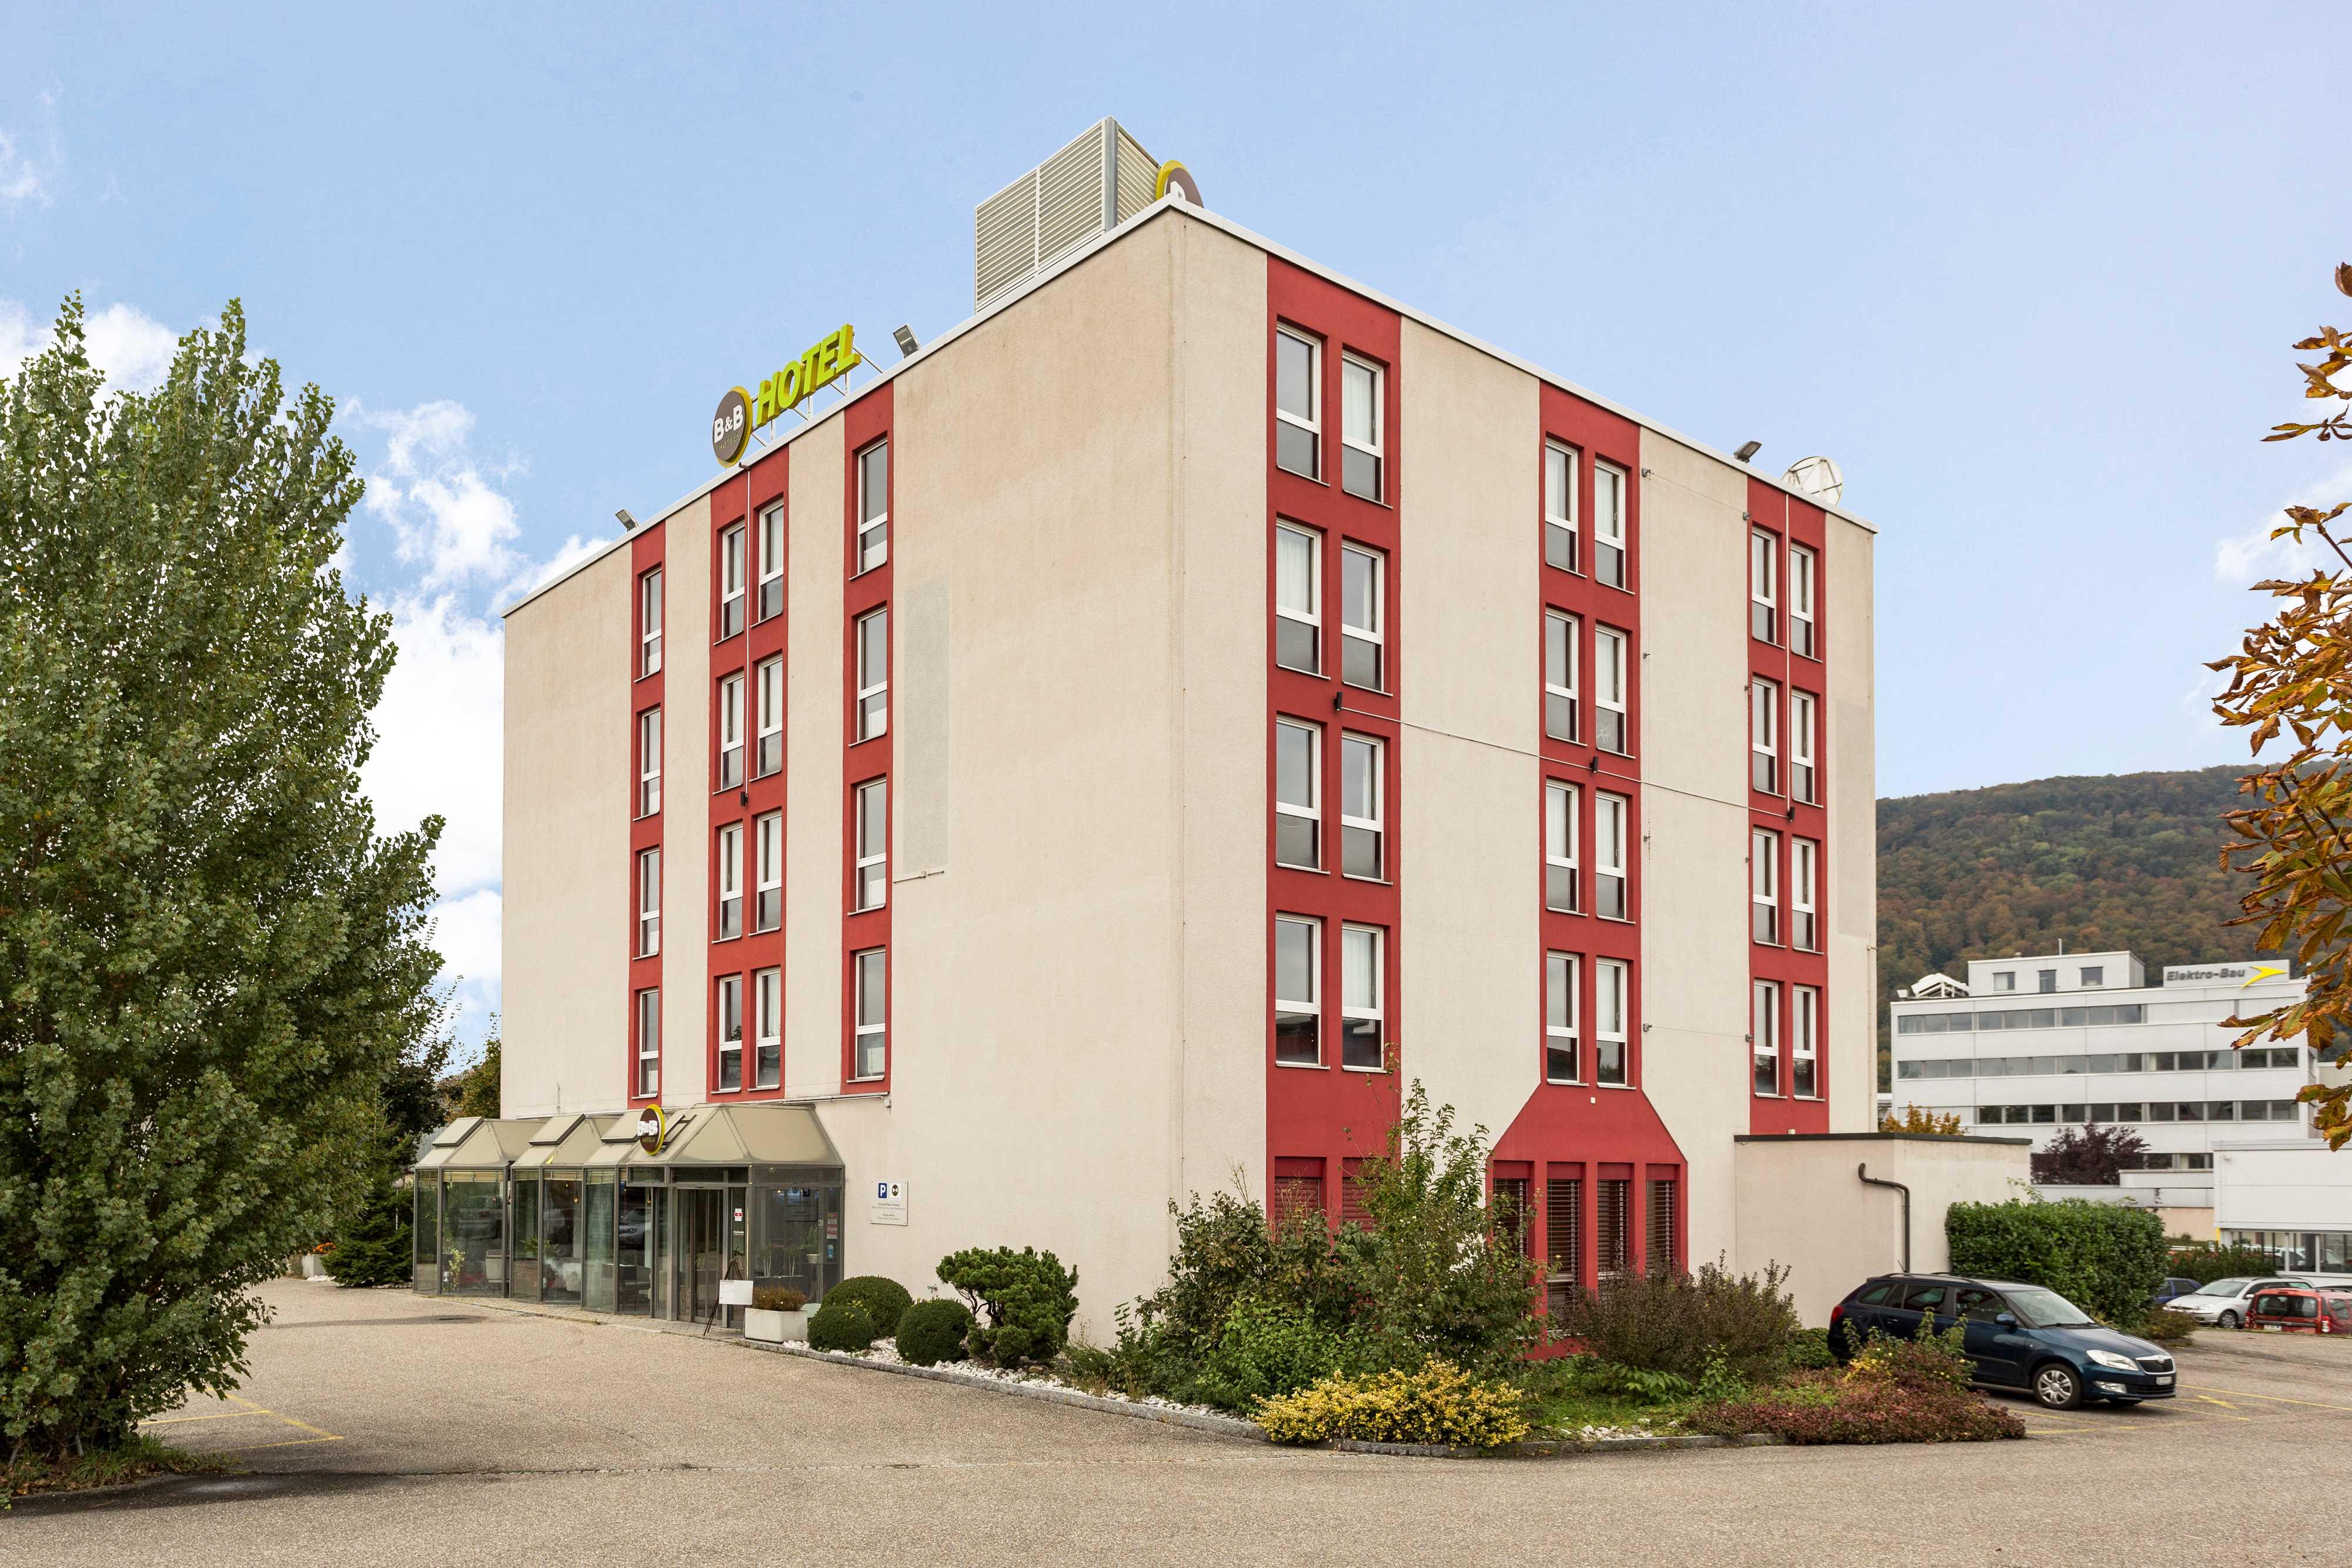 Hotel B&B Rothrist Olten 4